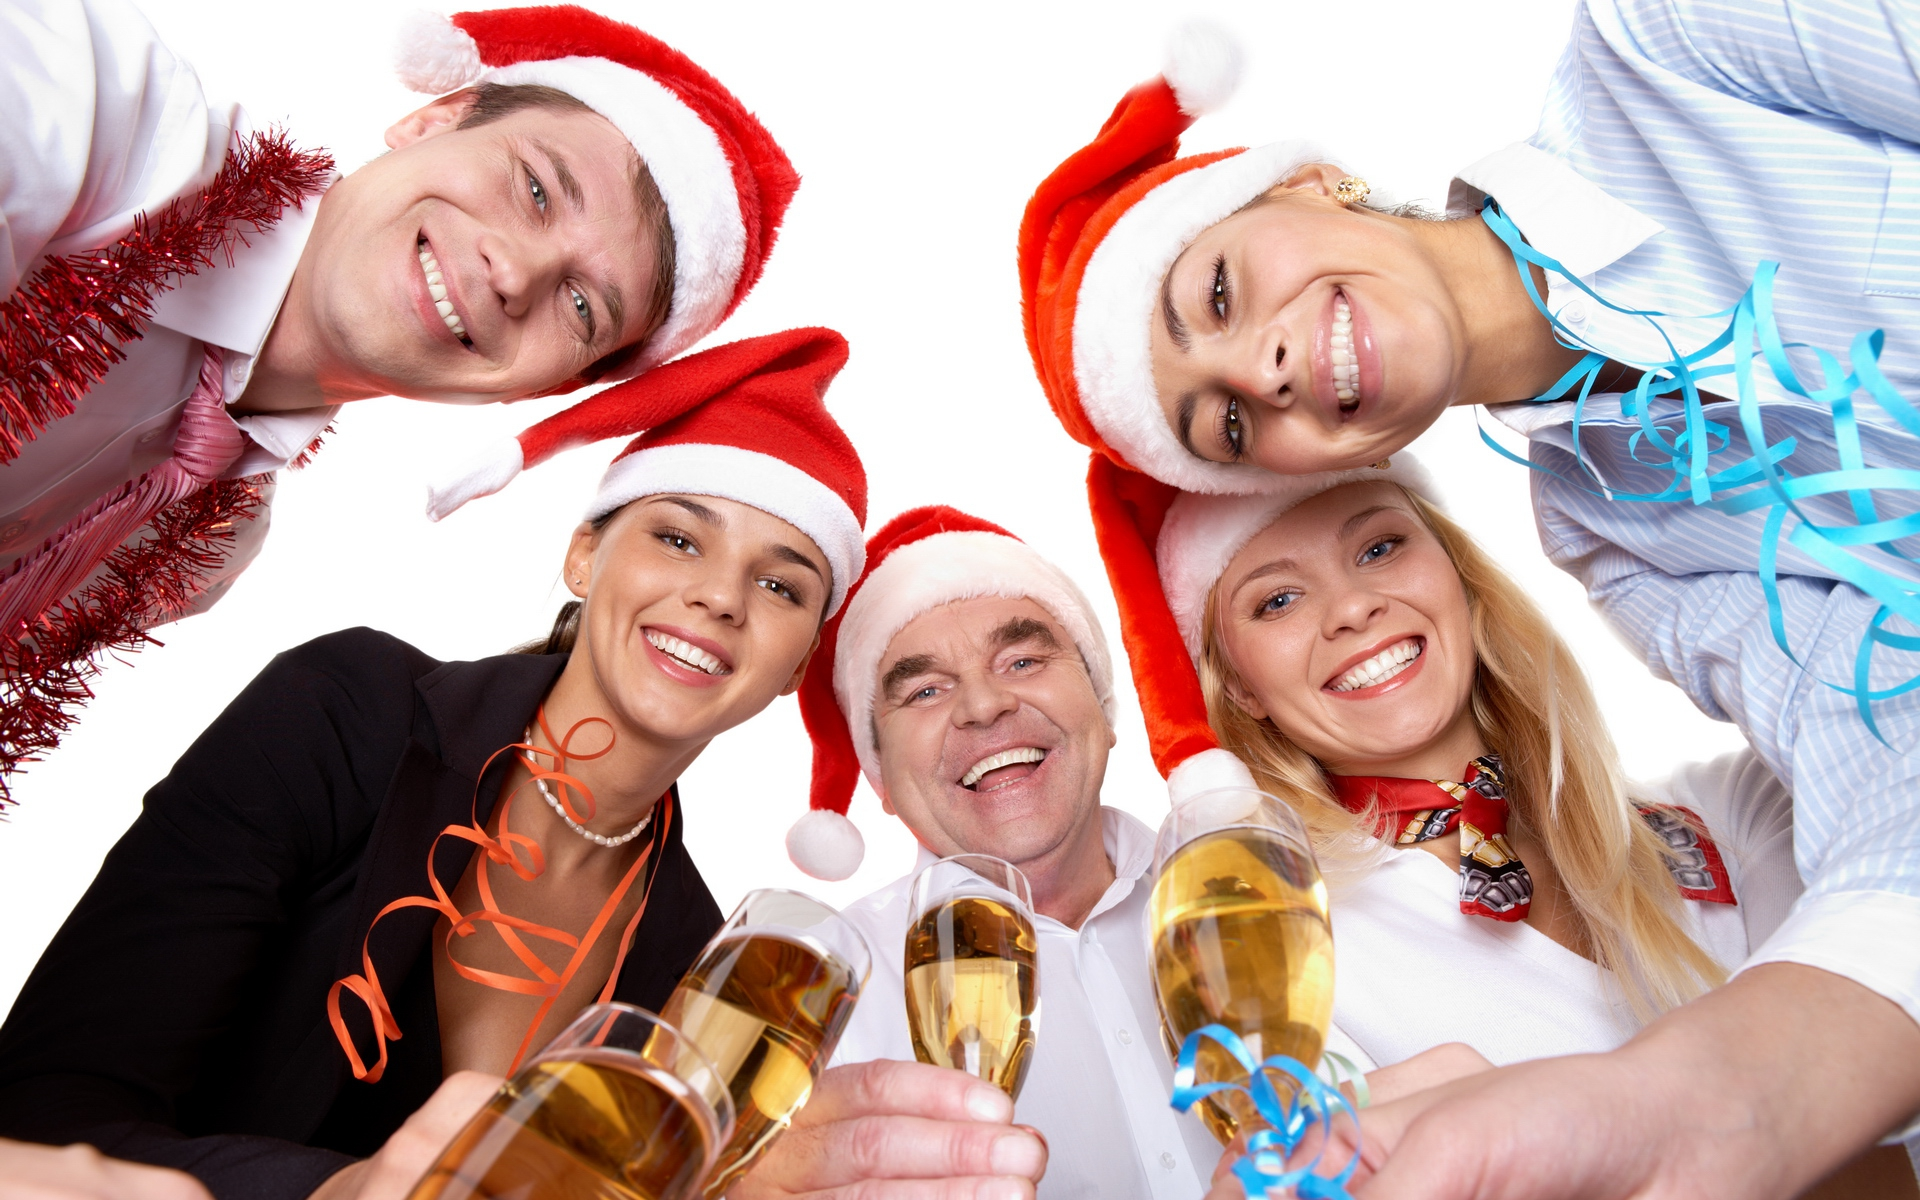 картинки веселой встречи нового года